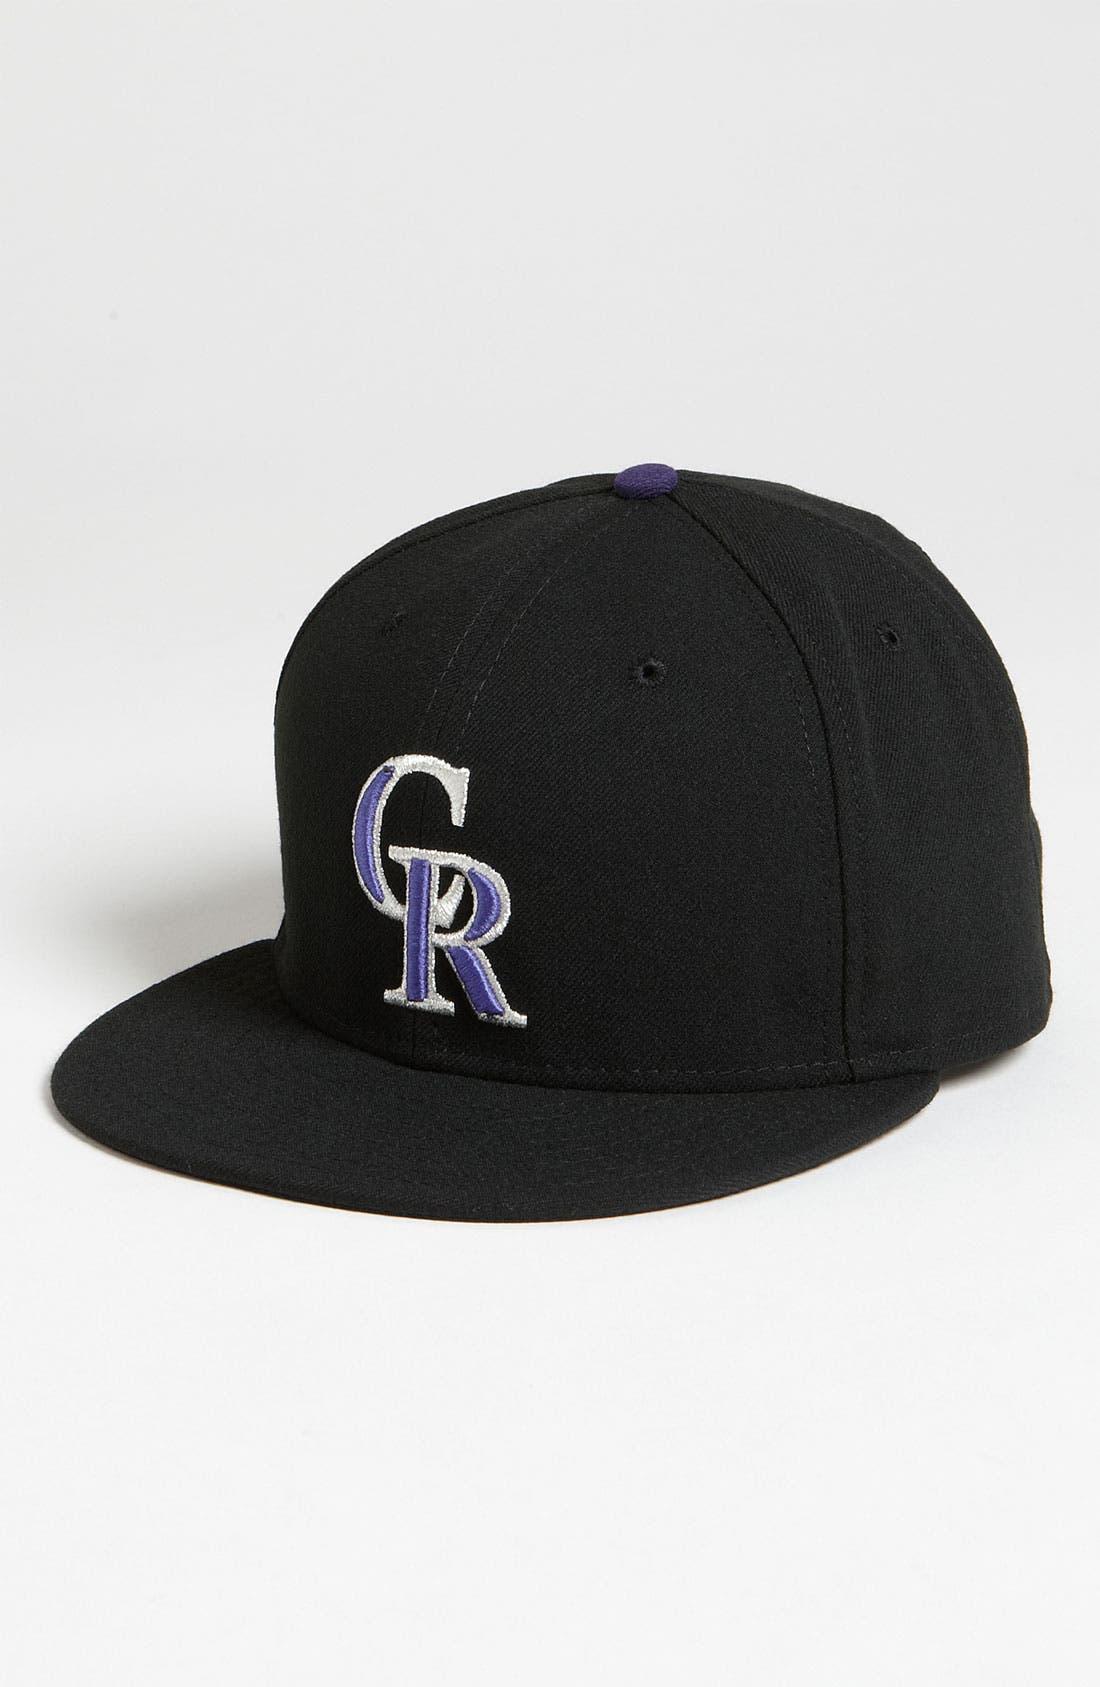 Alternate Image 1 Selected - New Era Cap 'Colorado Rockies' Baseball Cap